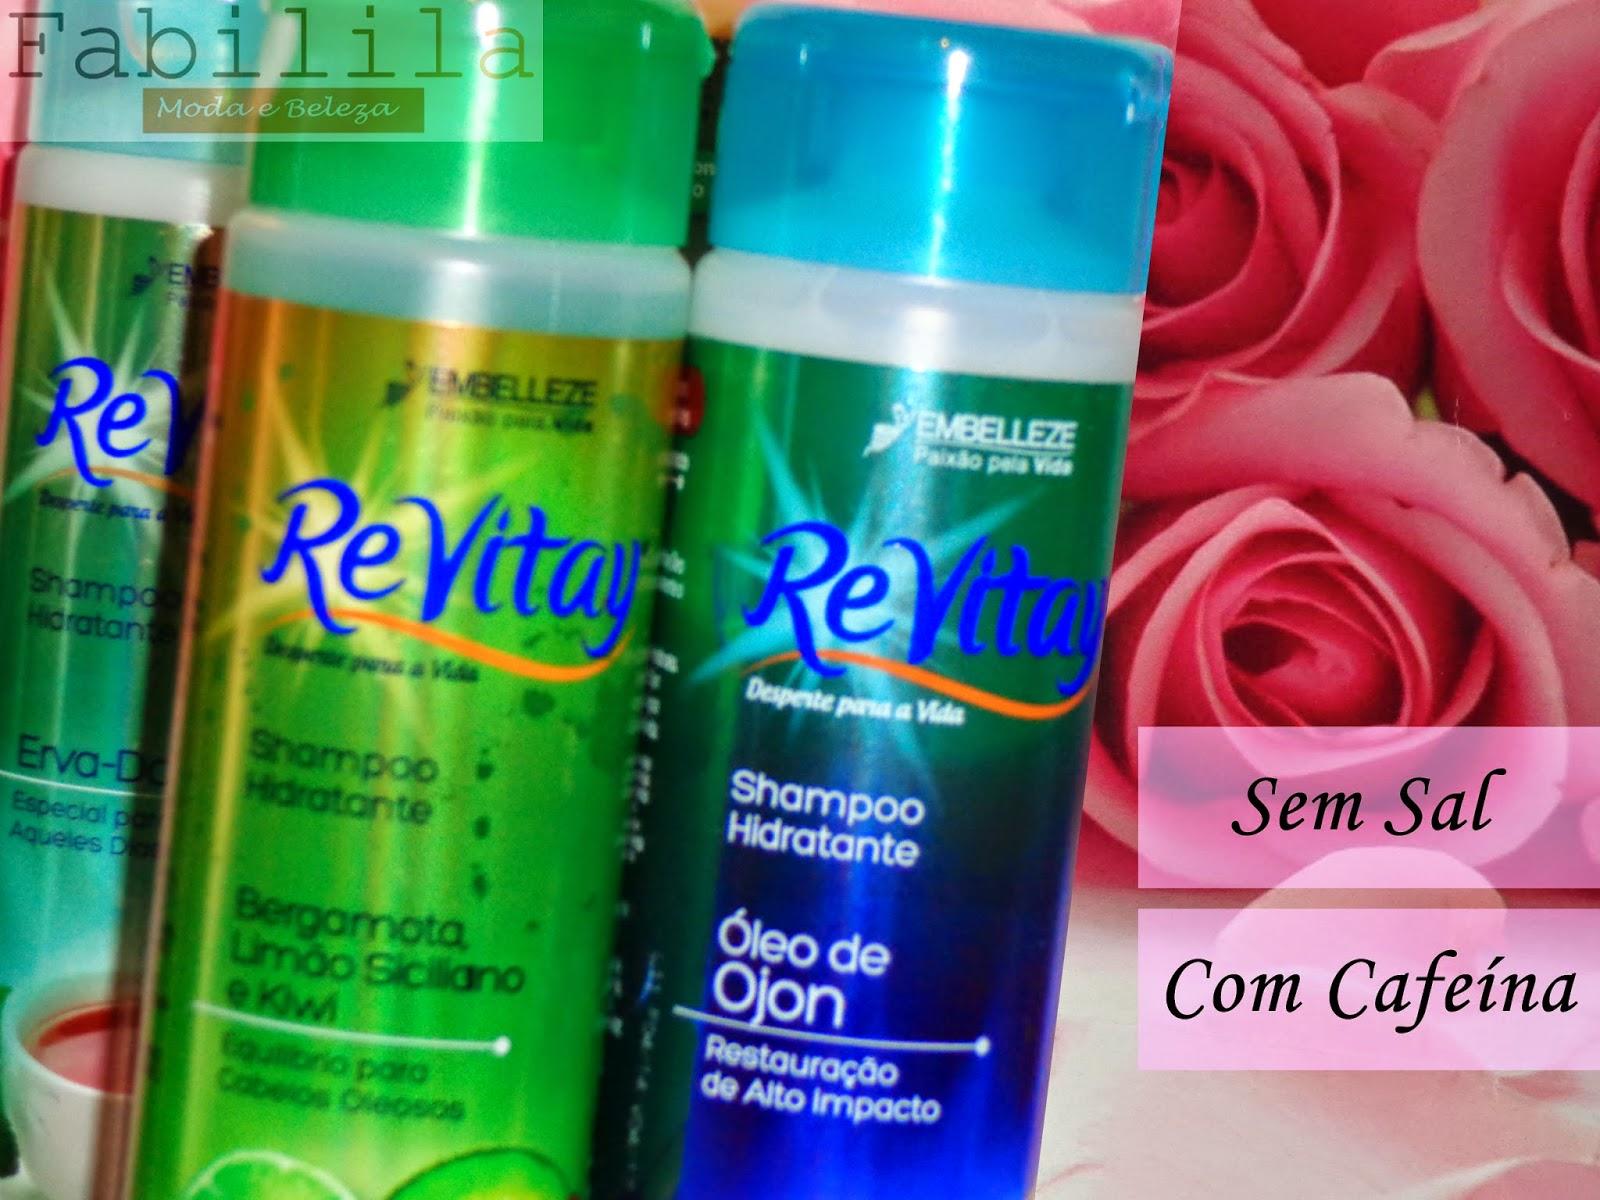 Shampoos ReVitay Embelleze